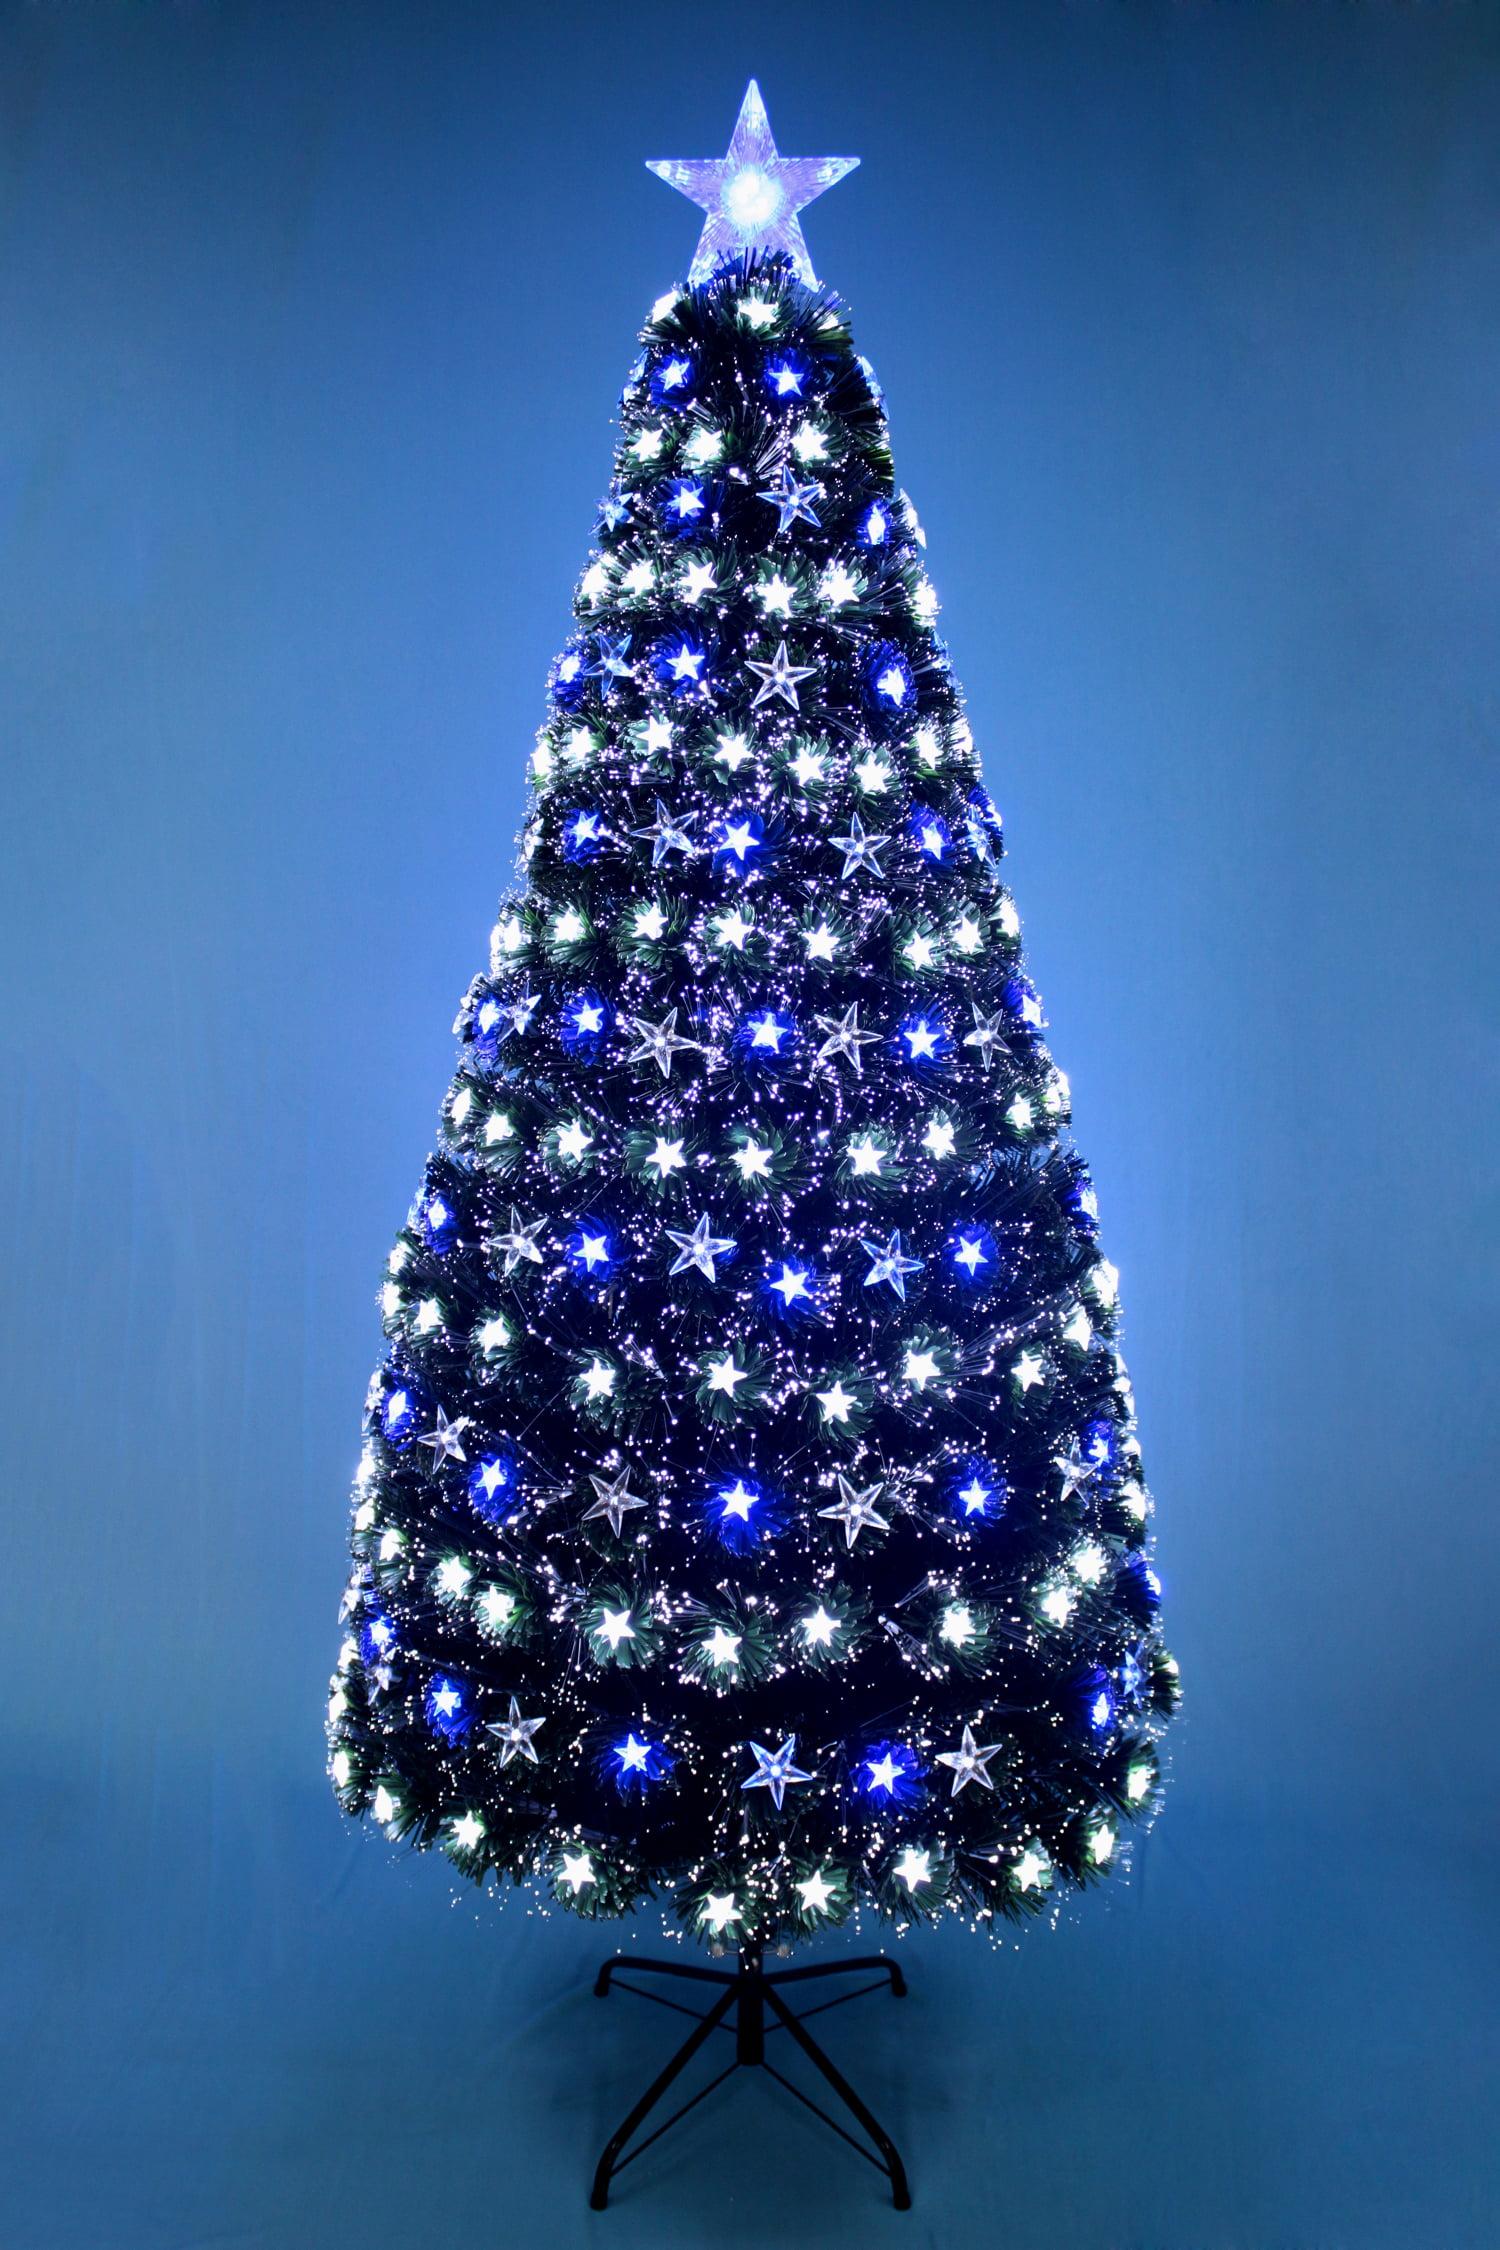 CHRISTMAS TREE FIBER OPTIC BLUE & WHITE STARS - Walmart.com